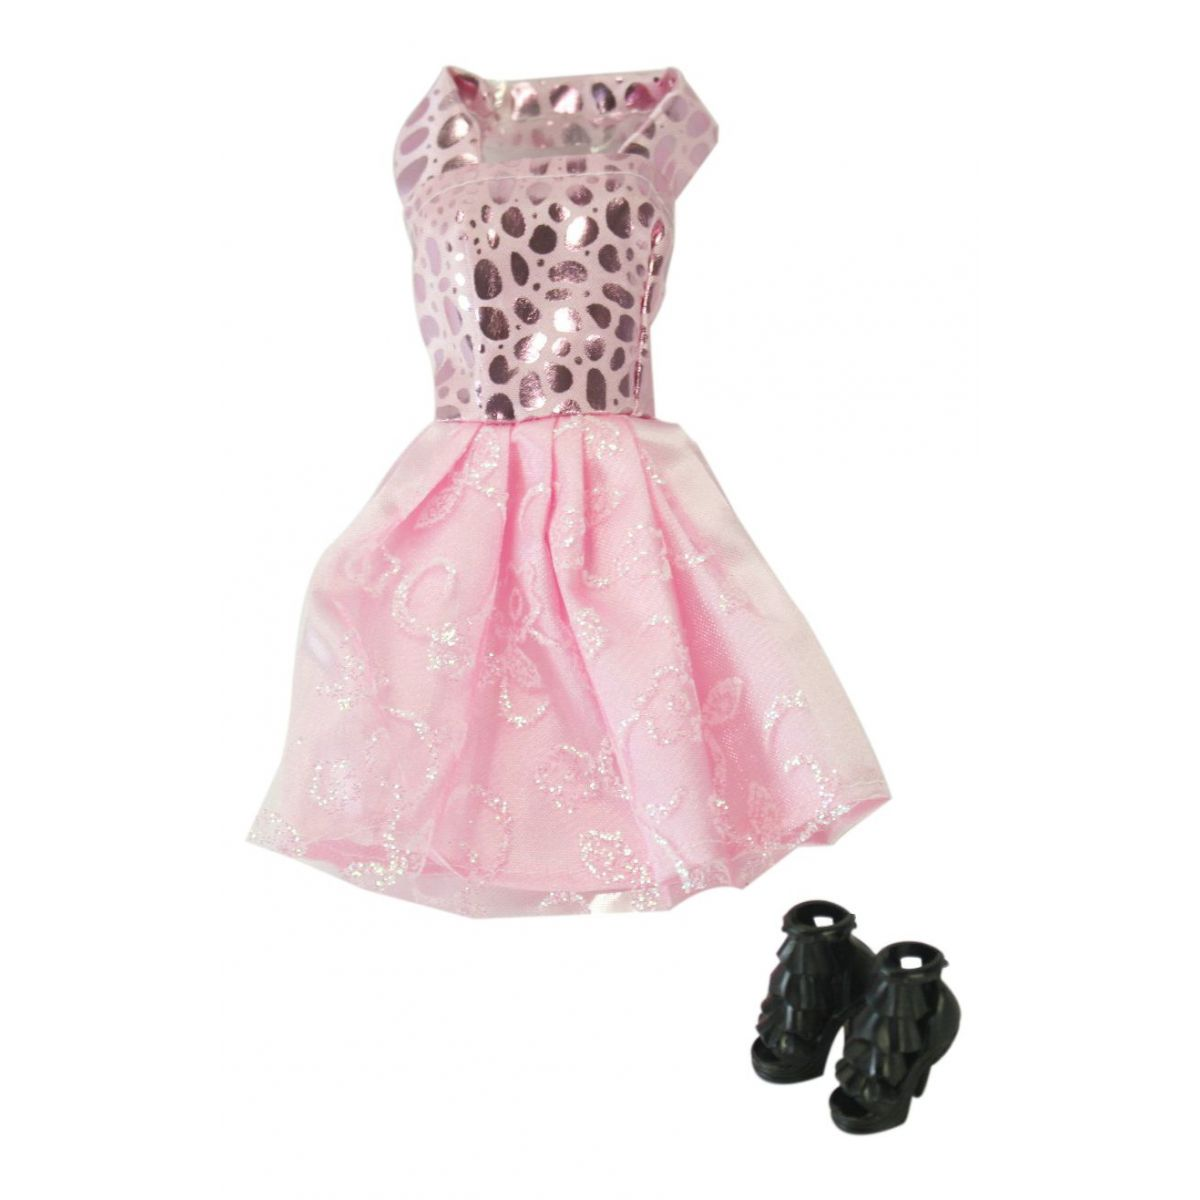 EPline Šatičky pro panenky s doplňky růžové šaty